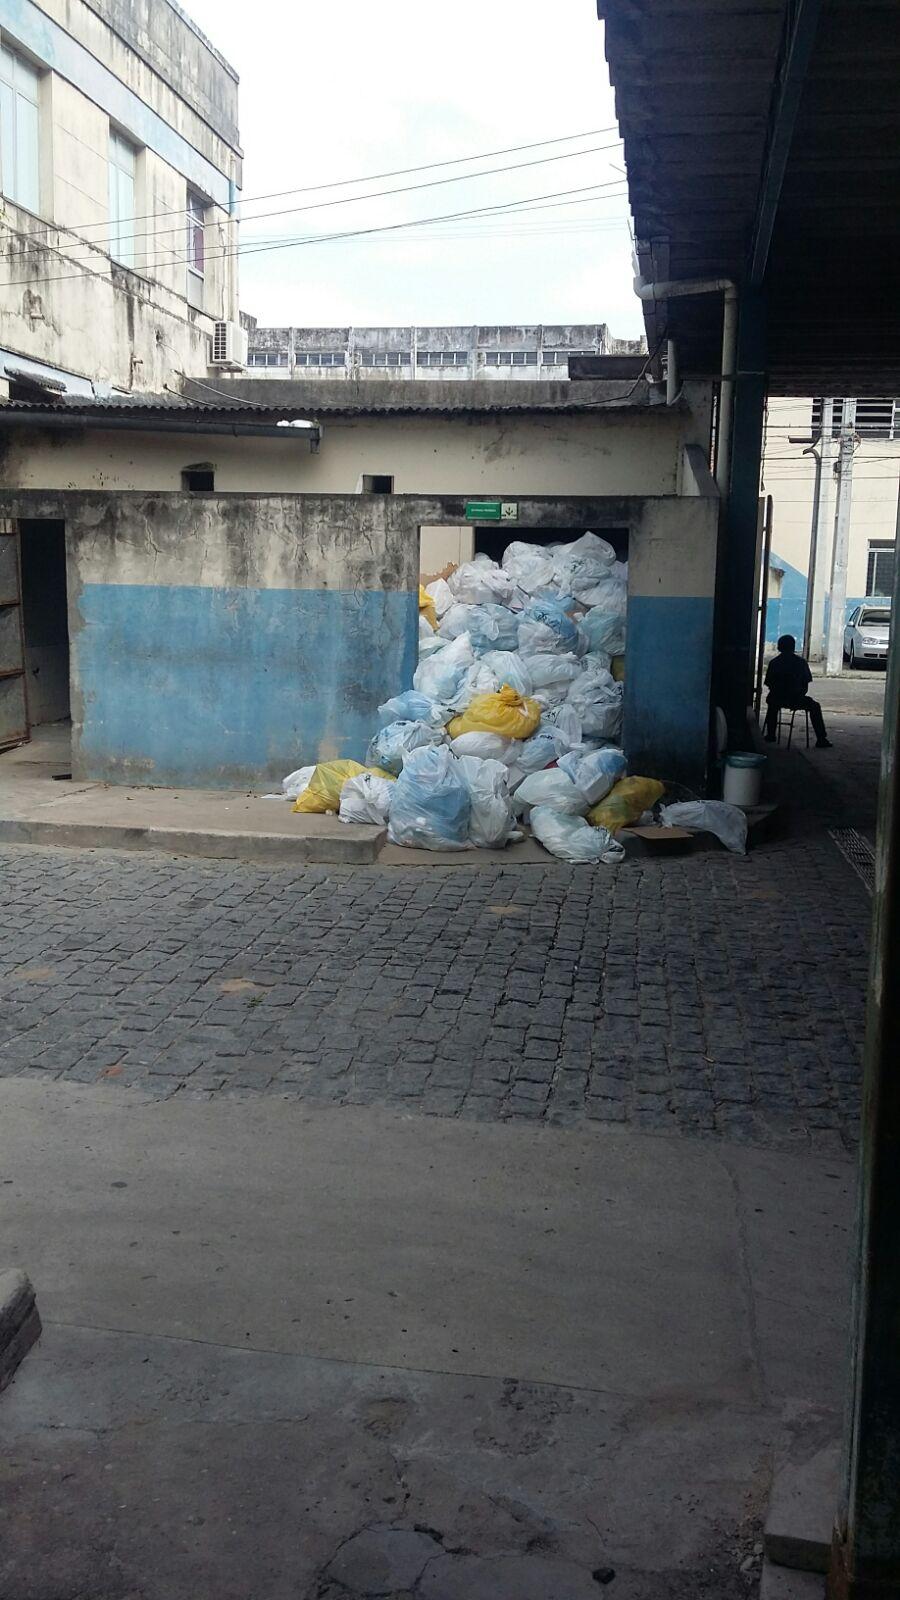 Meio Ambiente notifica Hospital Cirurgia por depósito irregular de lixo infectante